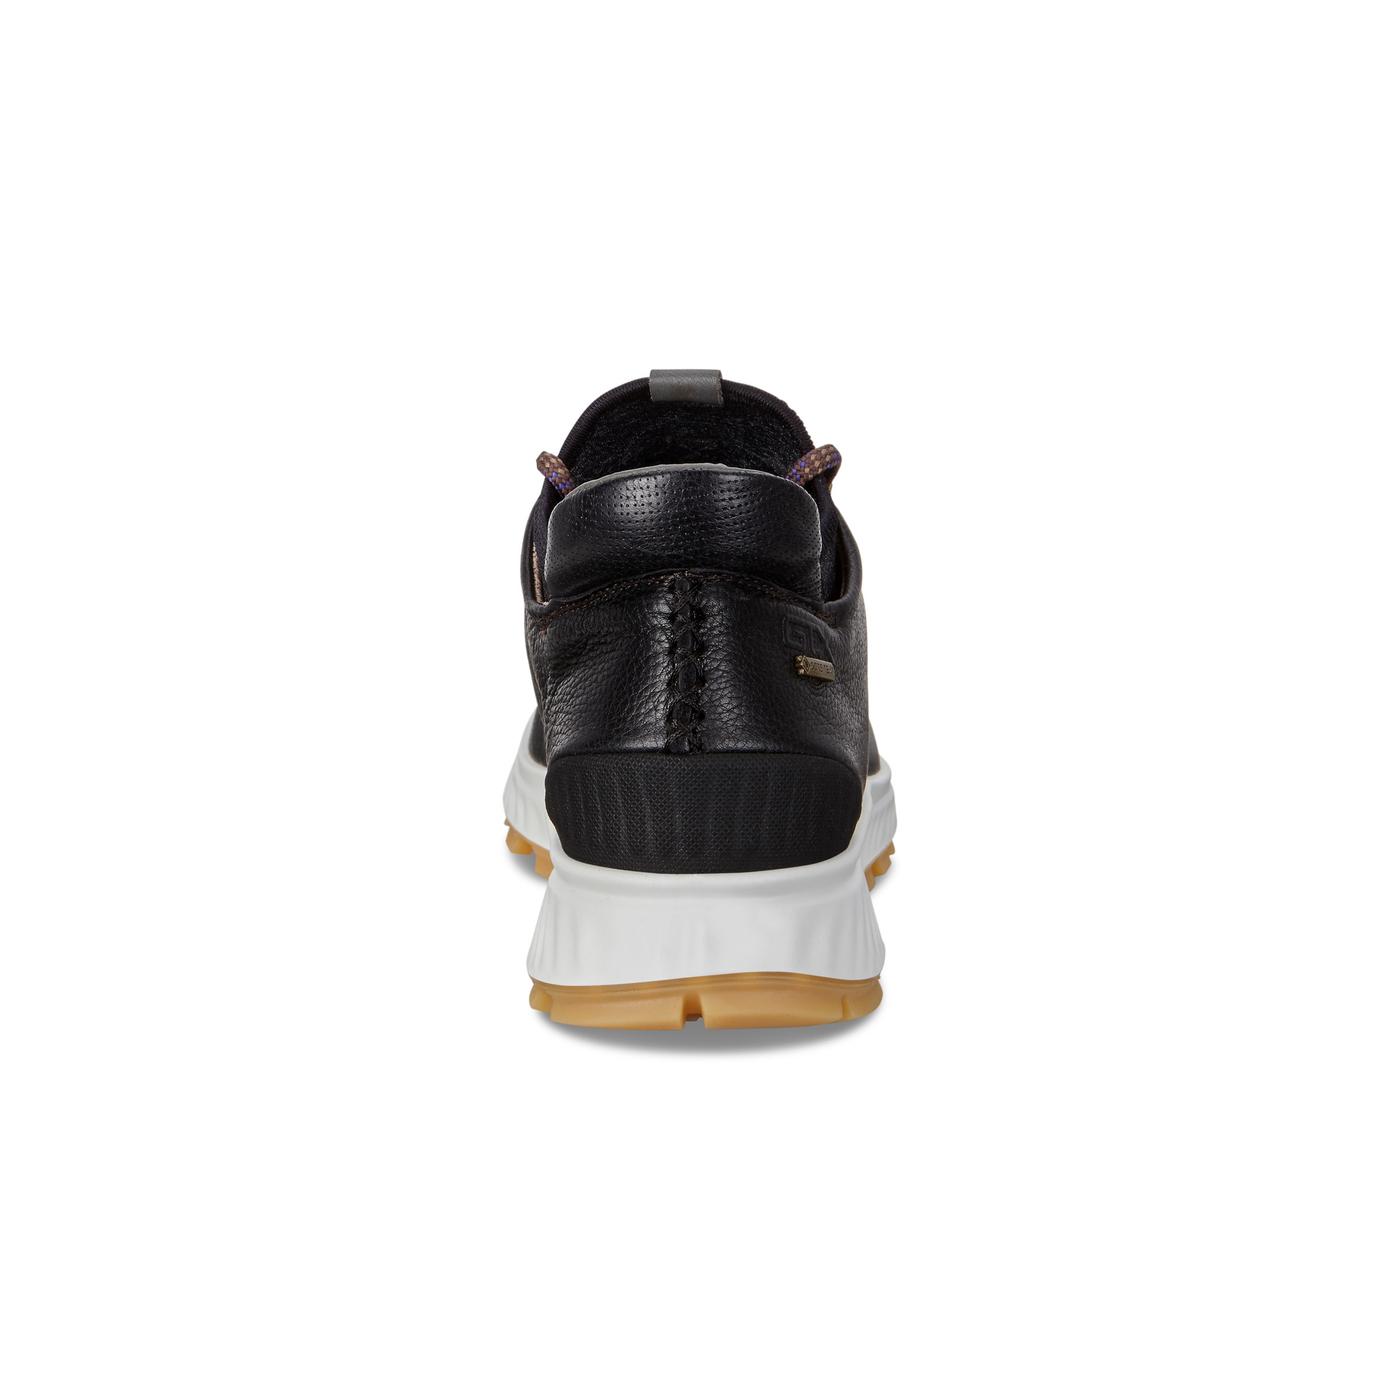 ECCO EXOSTRIKE L Outdoor Sneaker Lace GTX